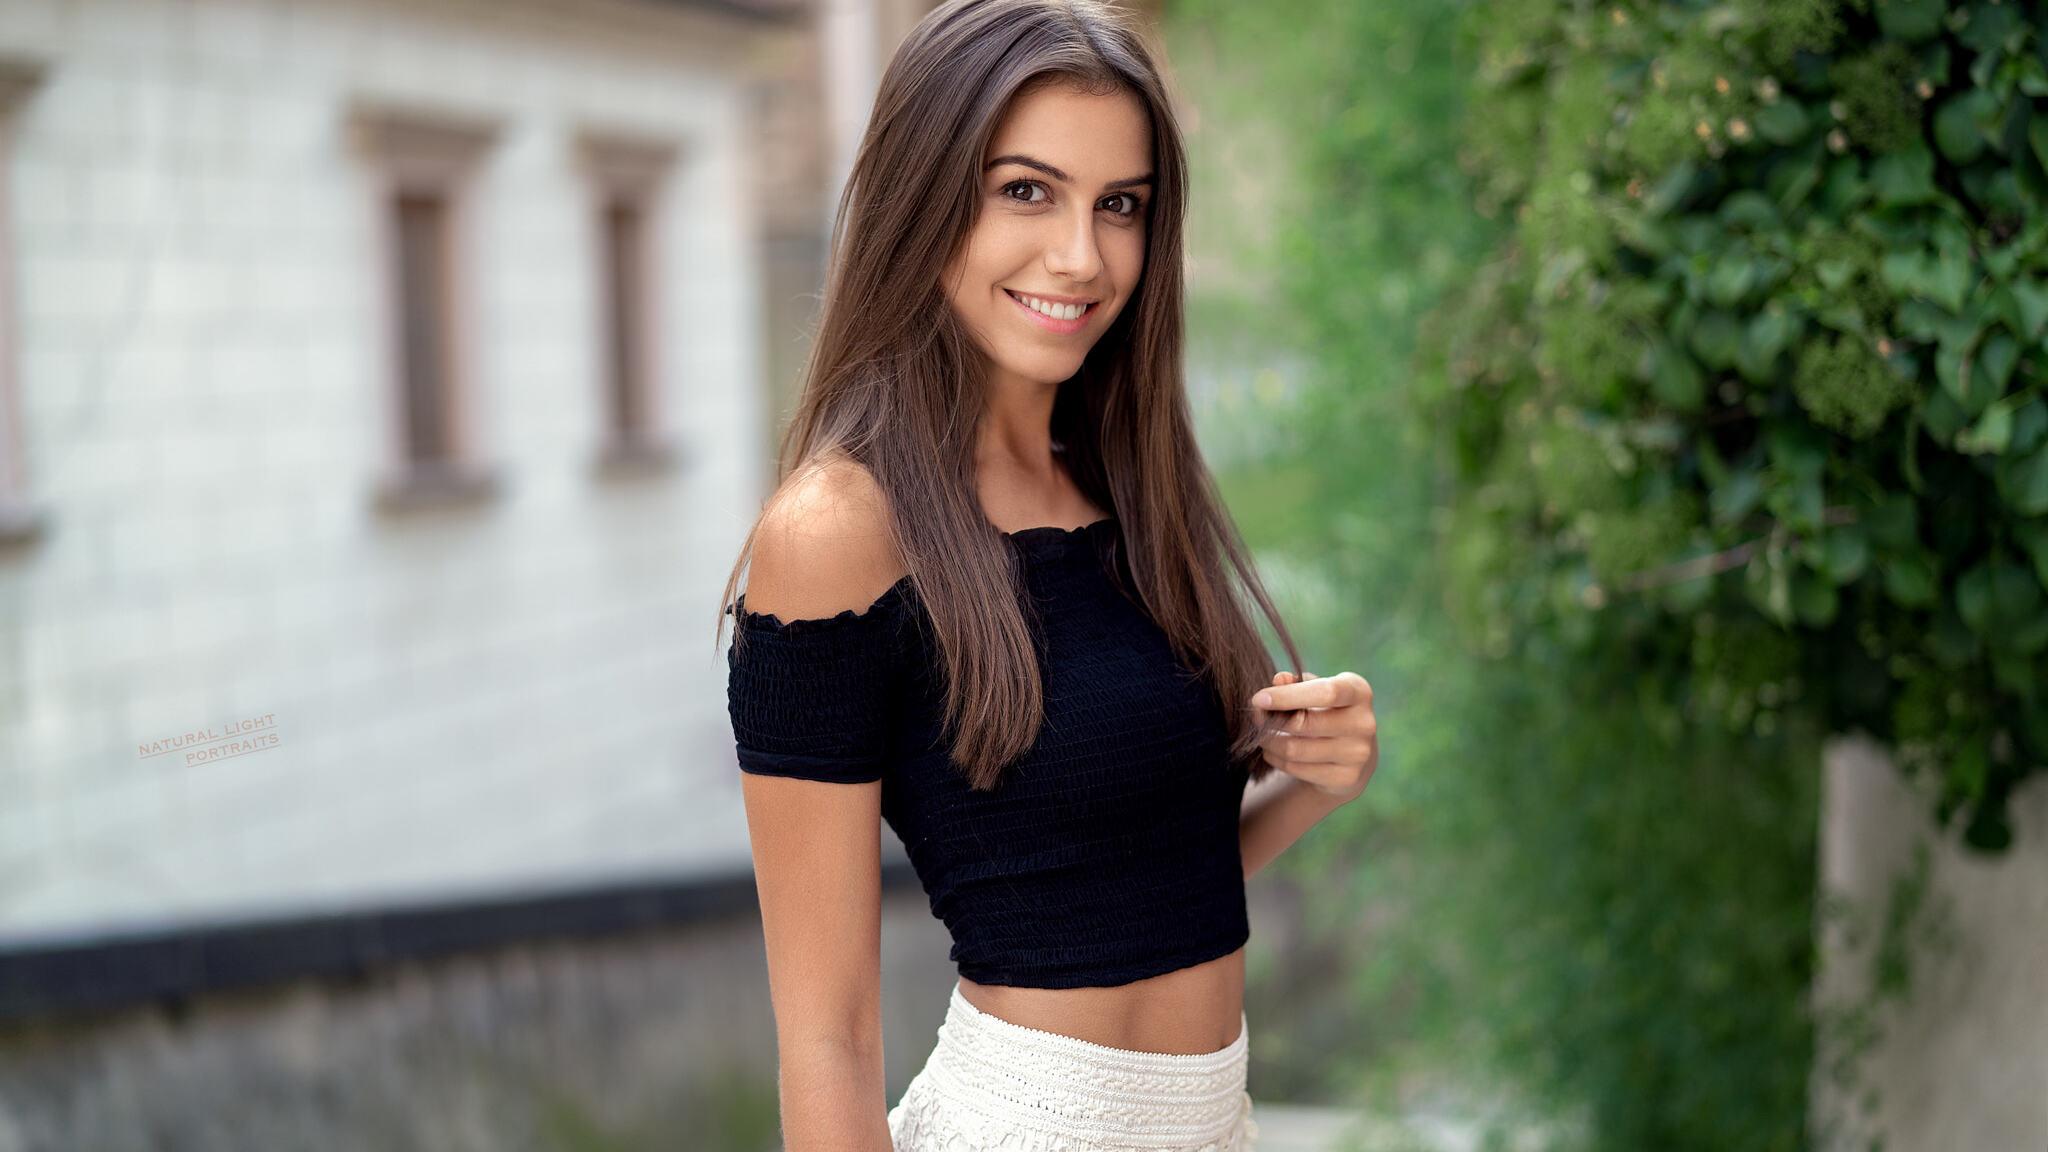 cute-smiling-girl-i7.jpg